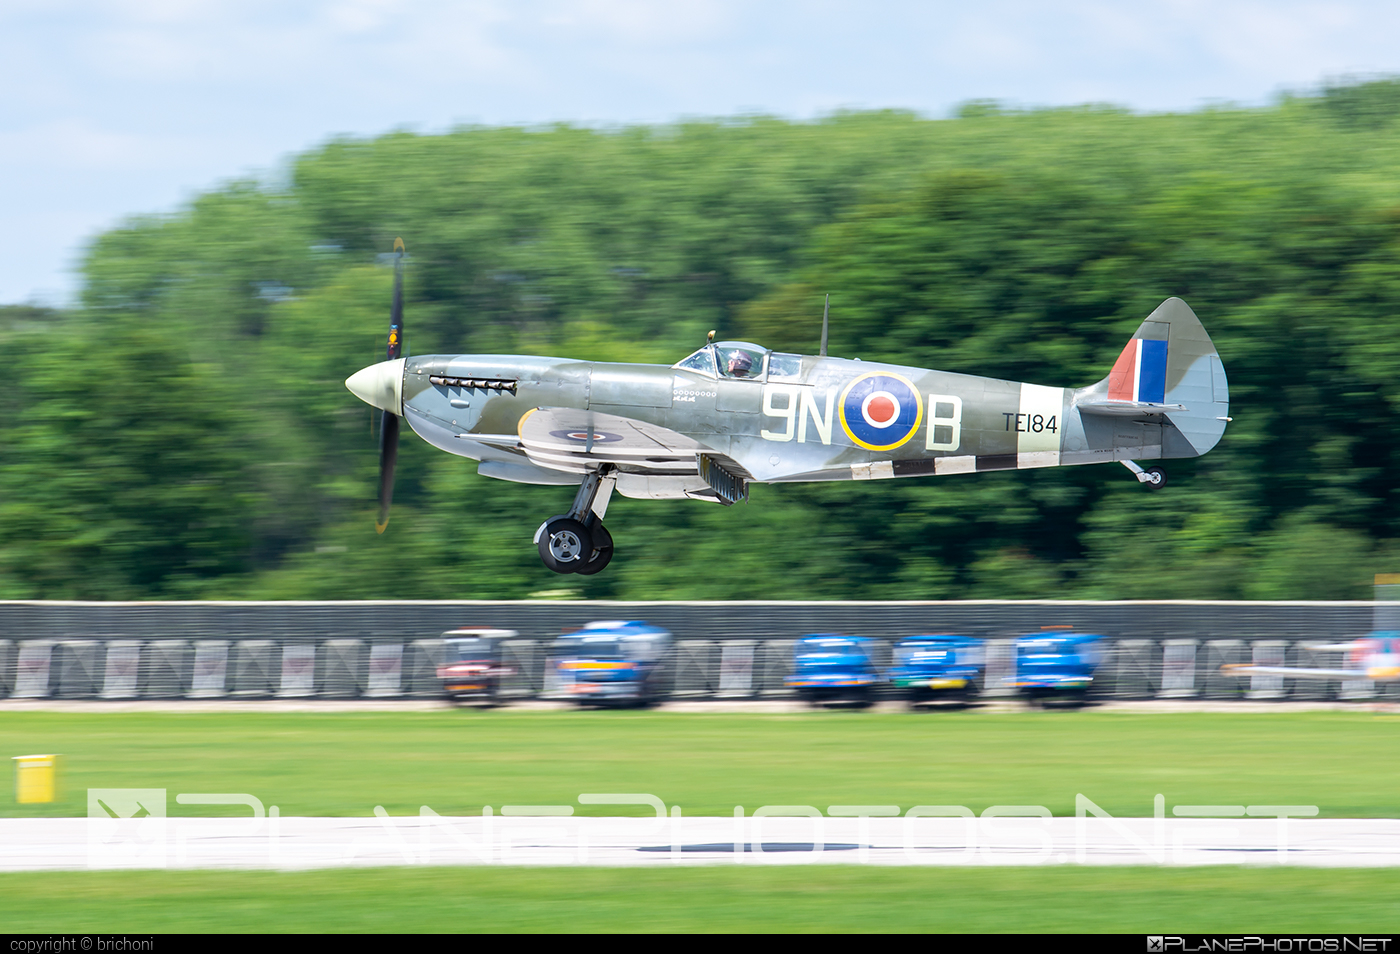 Supermarine Spitfire LF Mk.XVIe - G-MXVI operated by Private operator #spitfire #spitfirelfmkxvie #supermarine